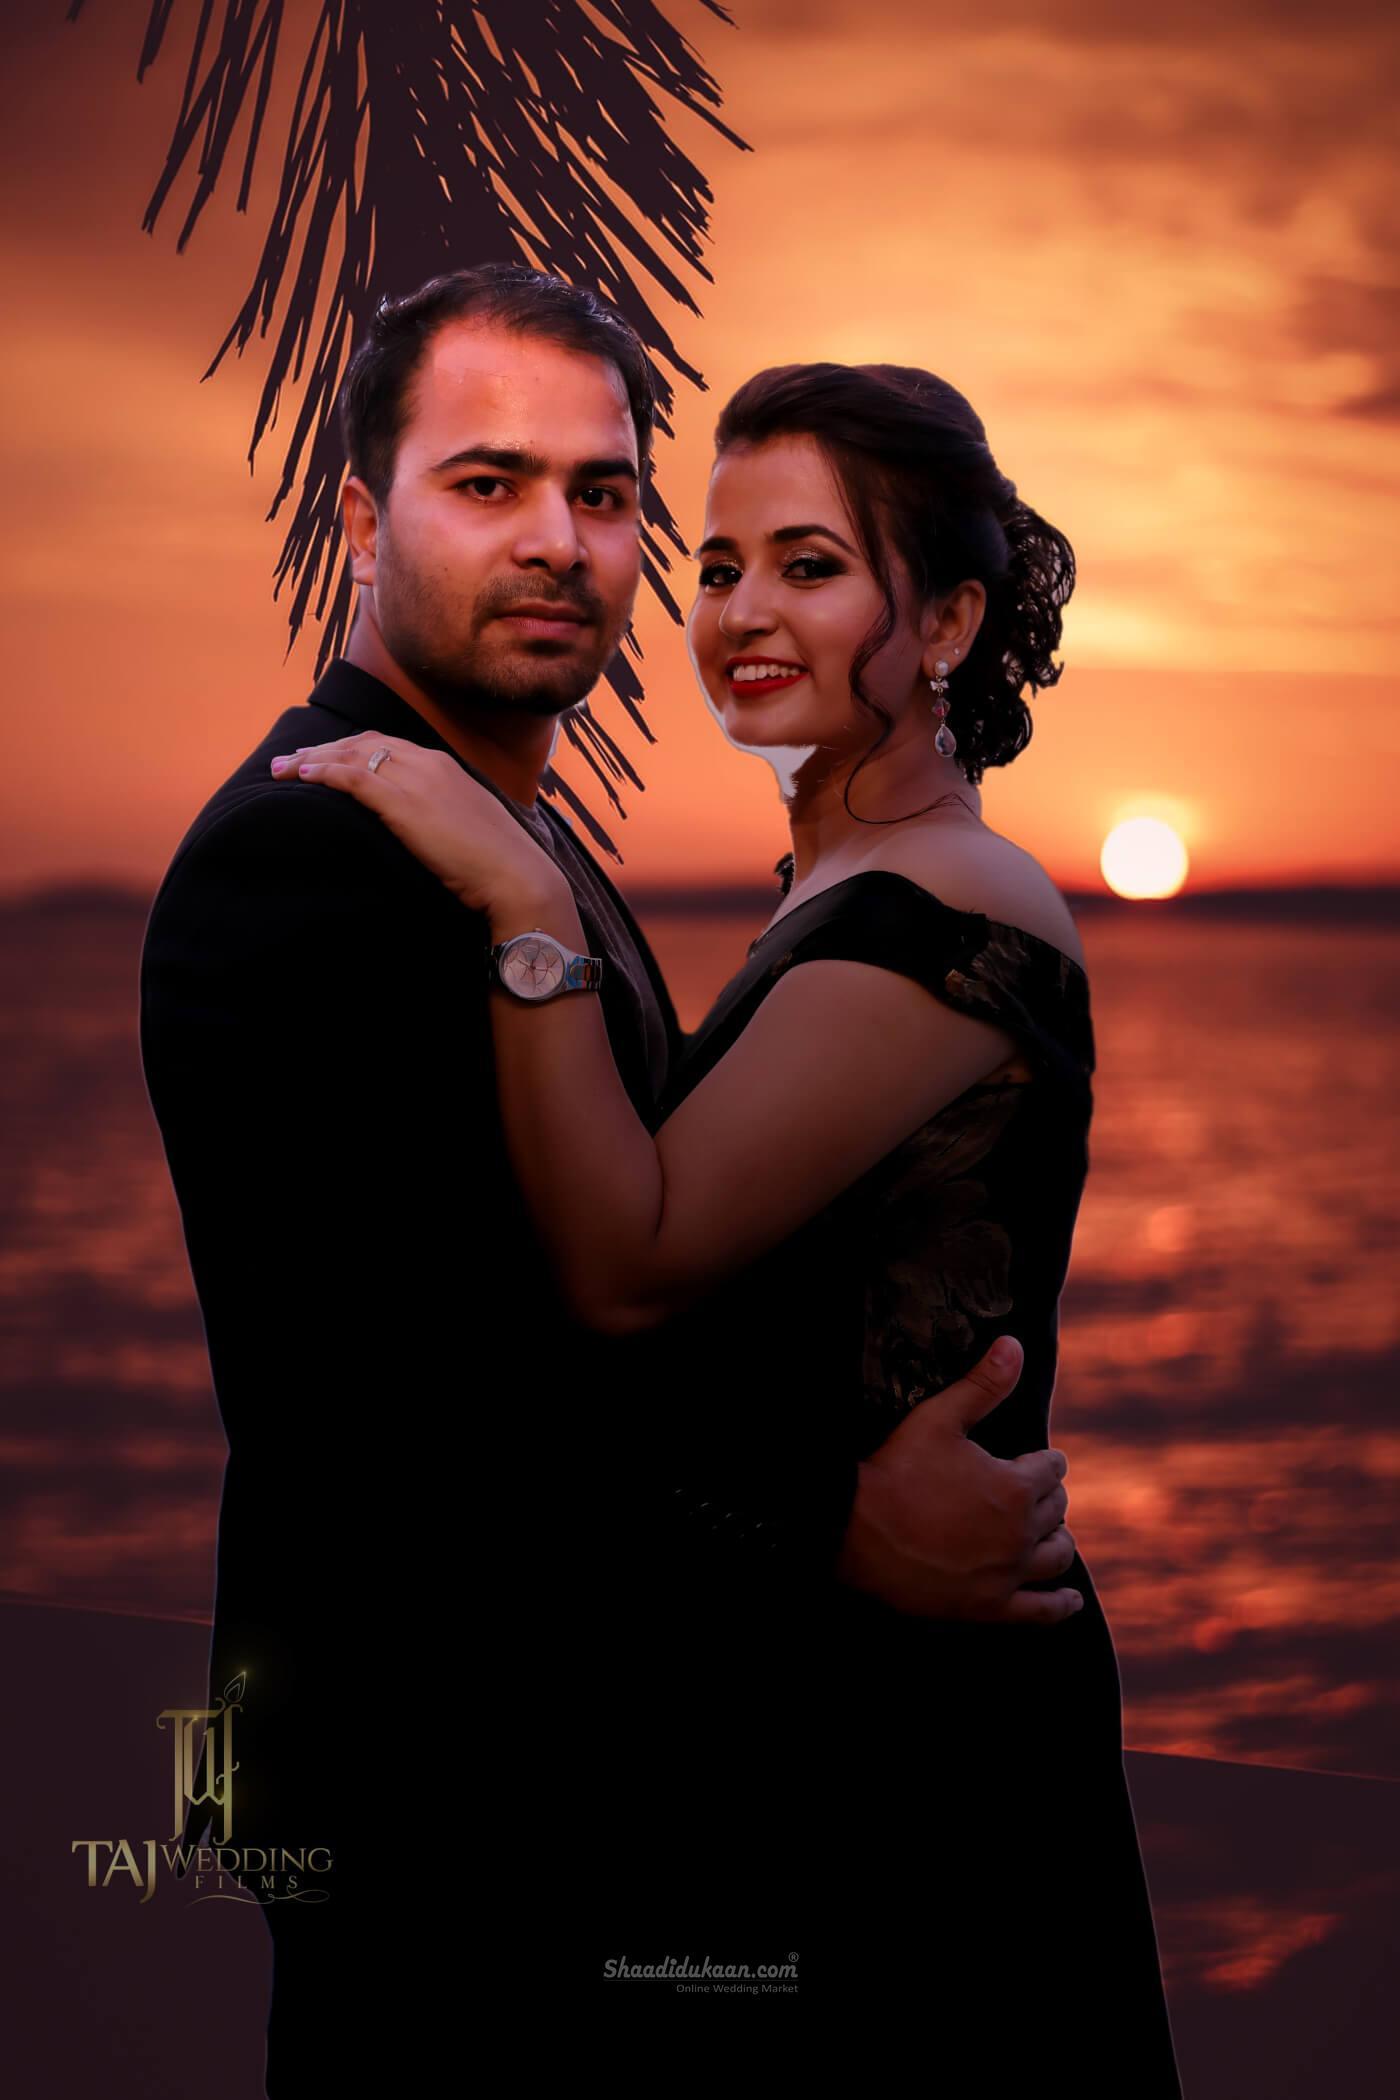 Taj Wedding Films